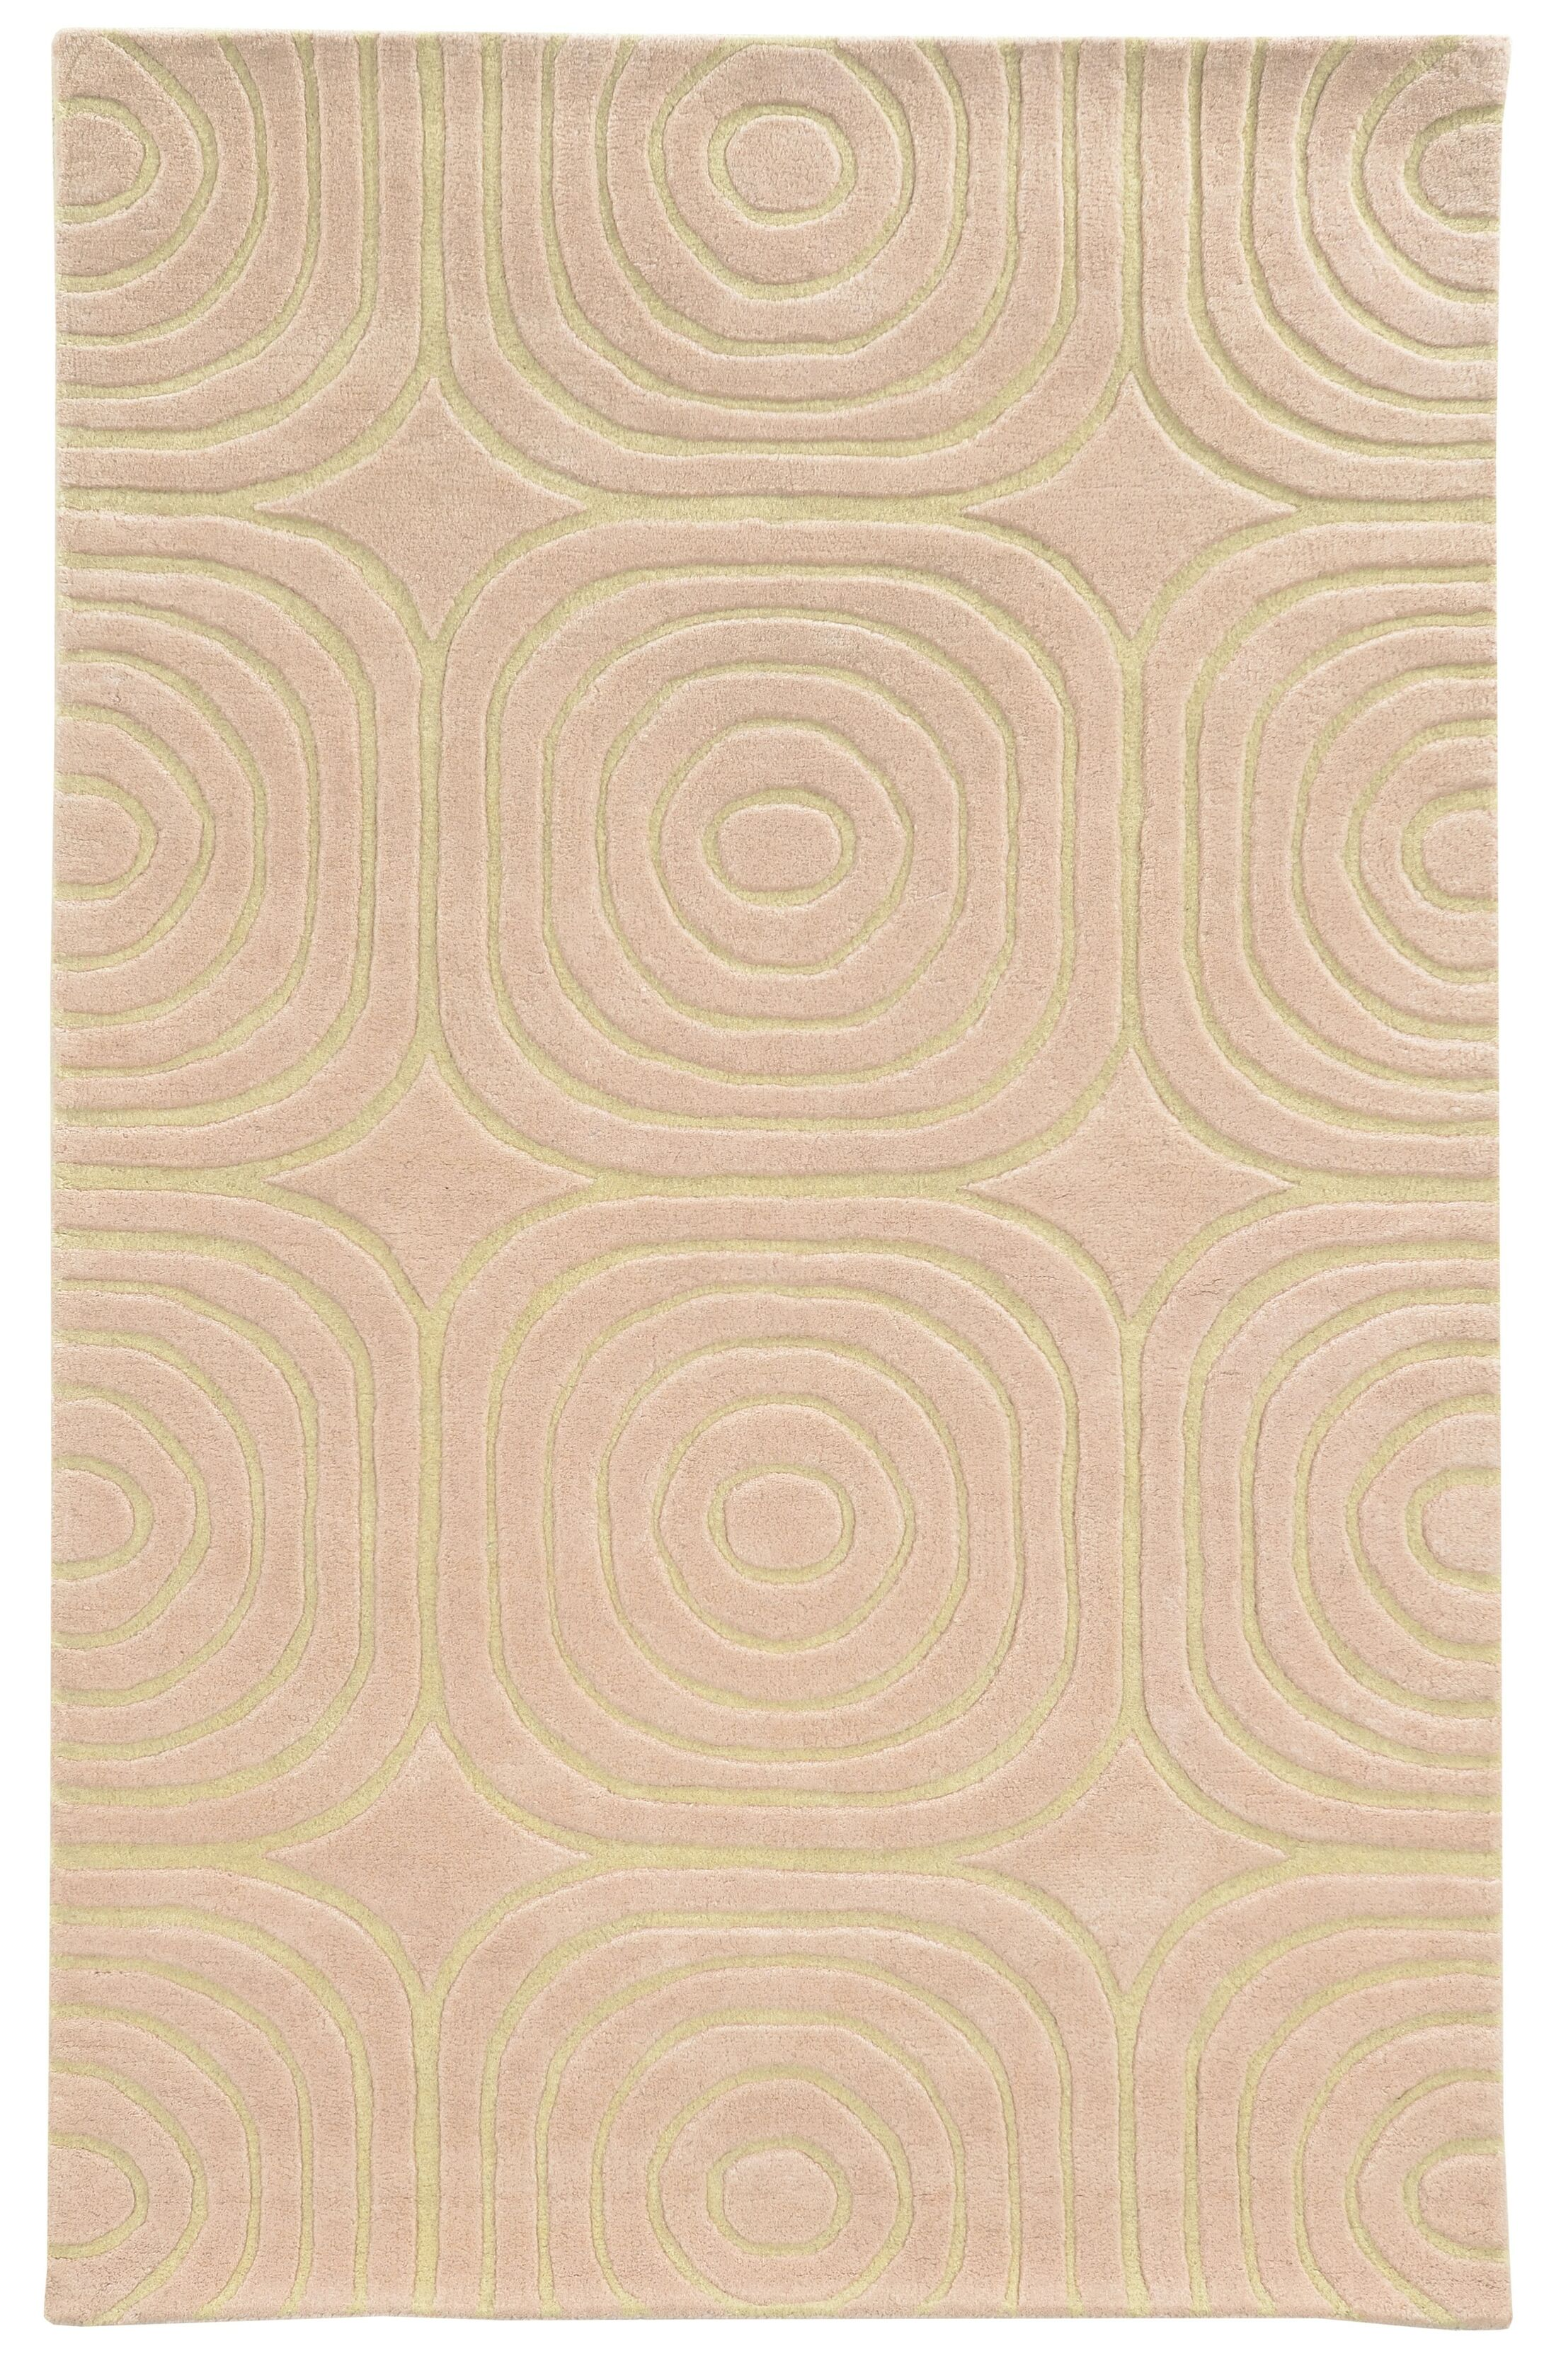 Optic Geometric Pink & Ivory Area Rug Rug Size: Rectangle 3'6